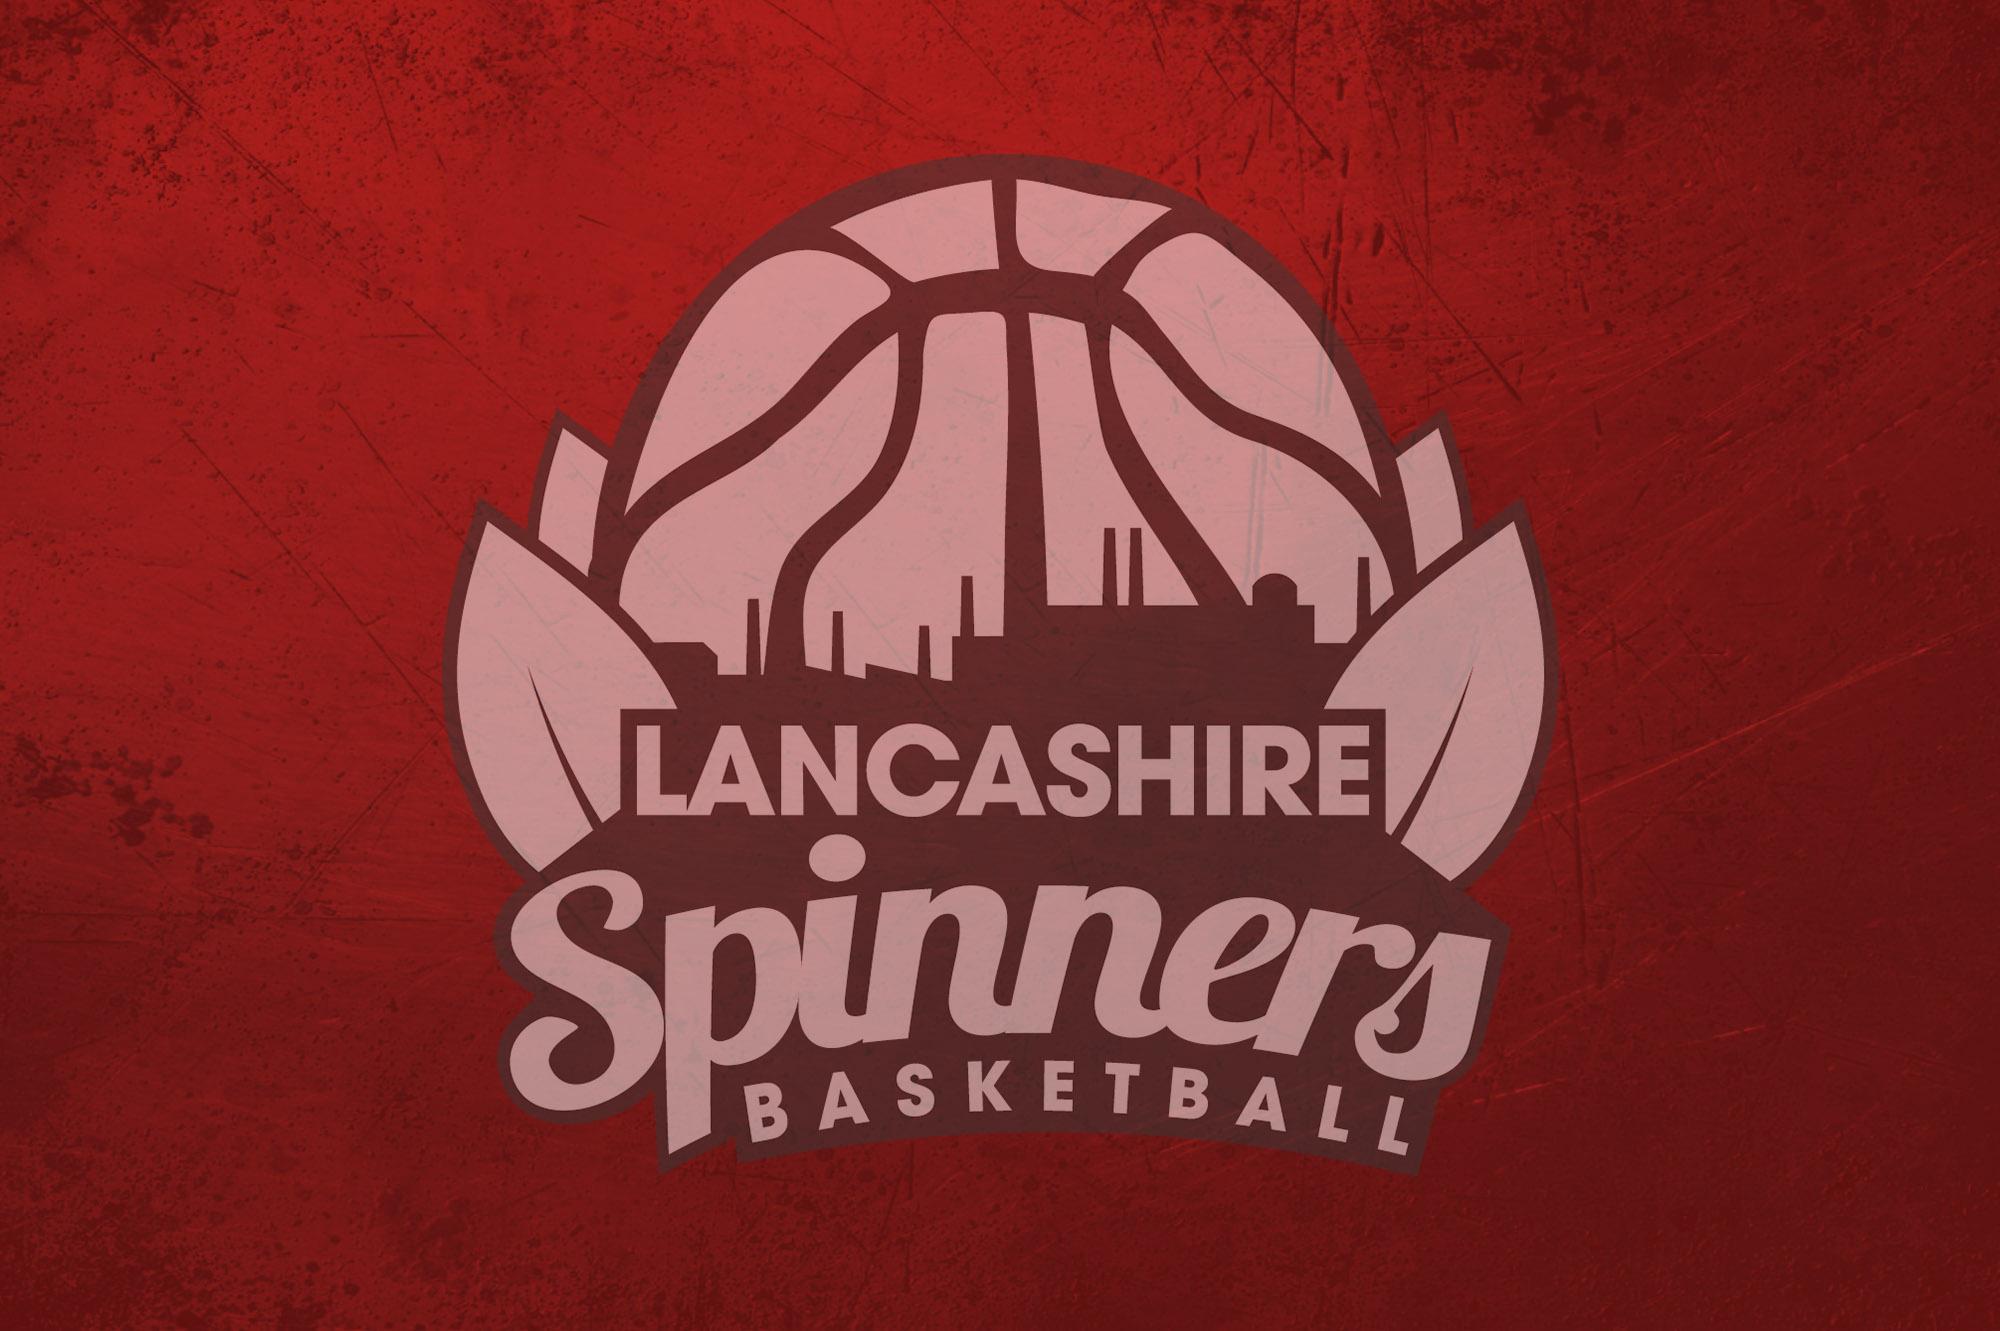 Lancashire Spinners